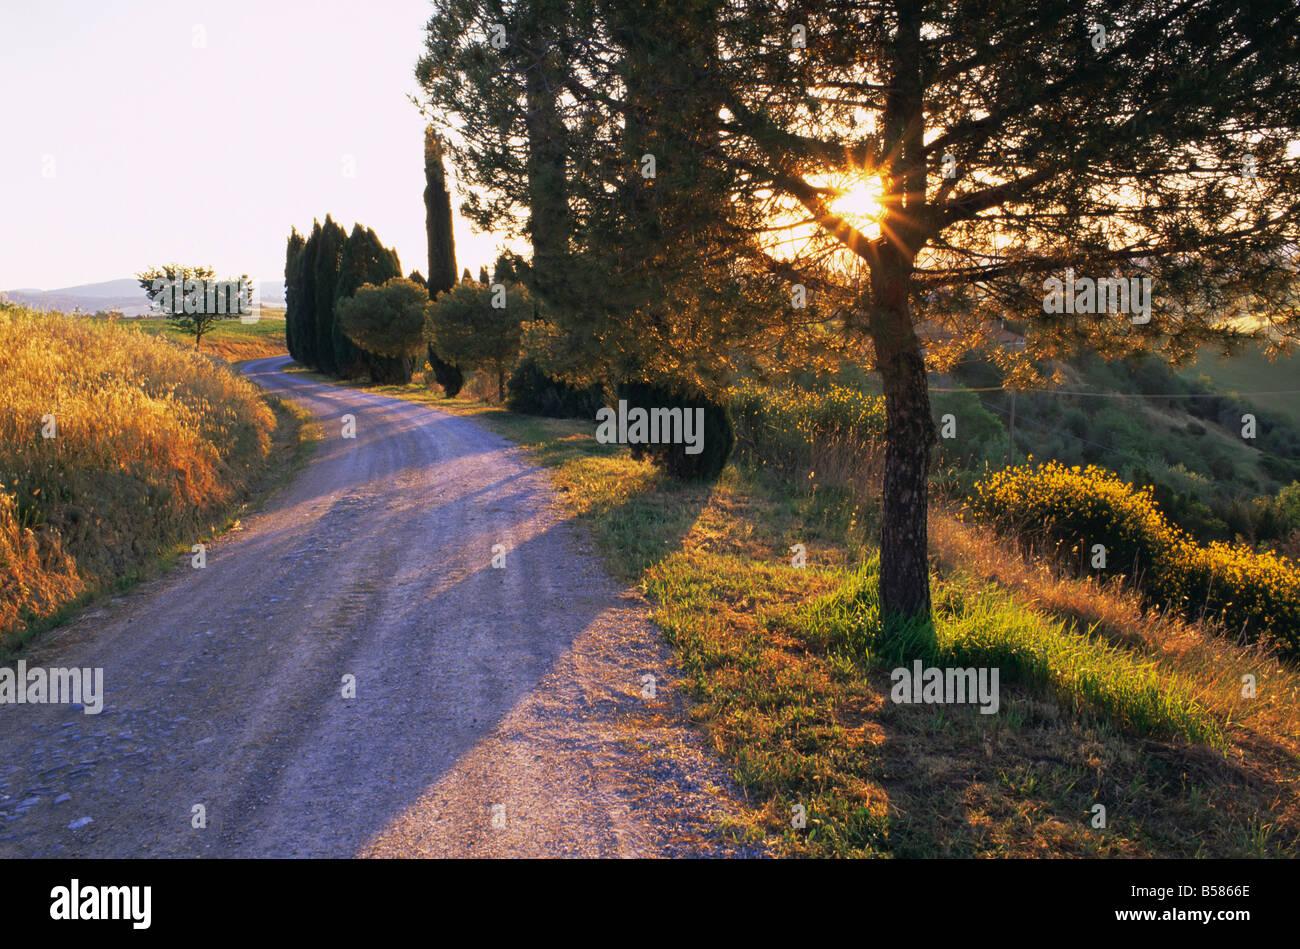 Country lane at sunrise, with sun shining through trees, near Pienza, Tuscany, Italy, Europe - Stock Image